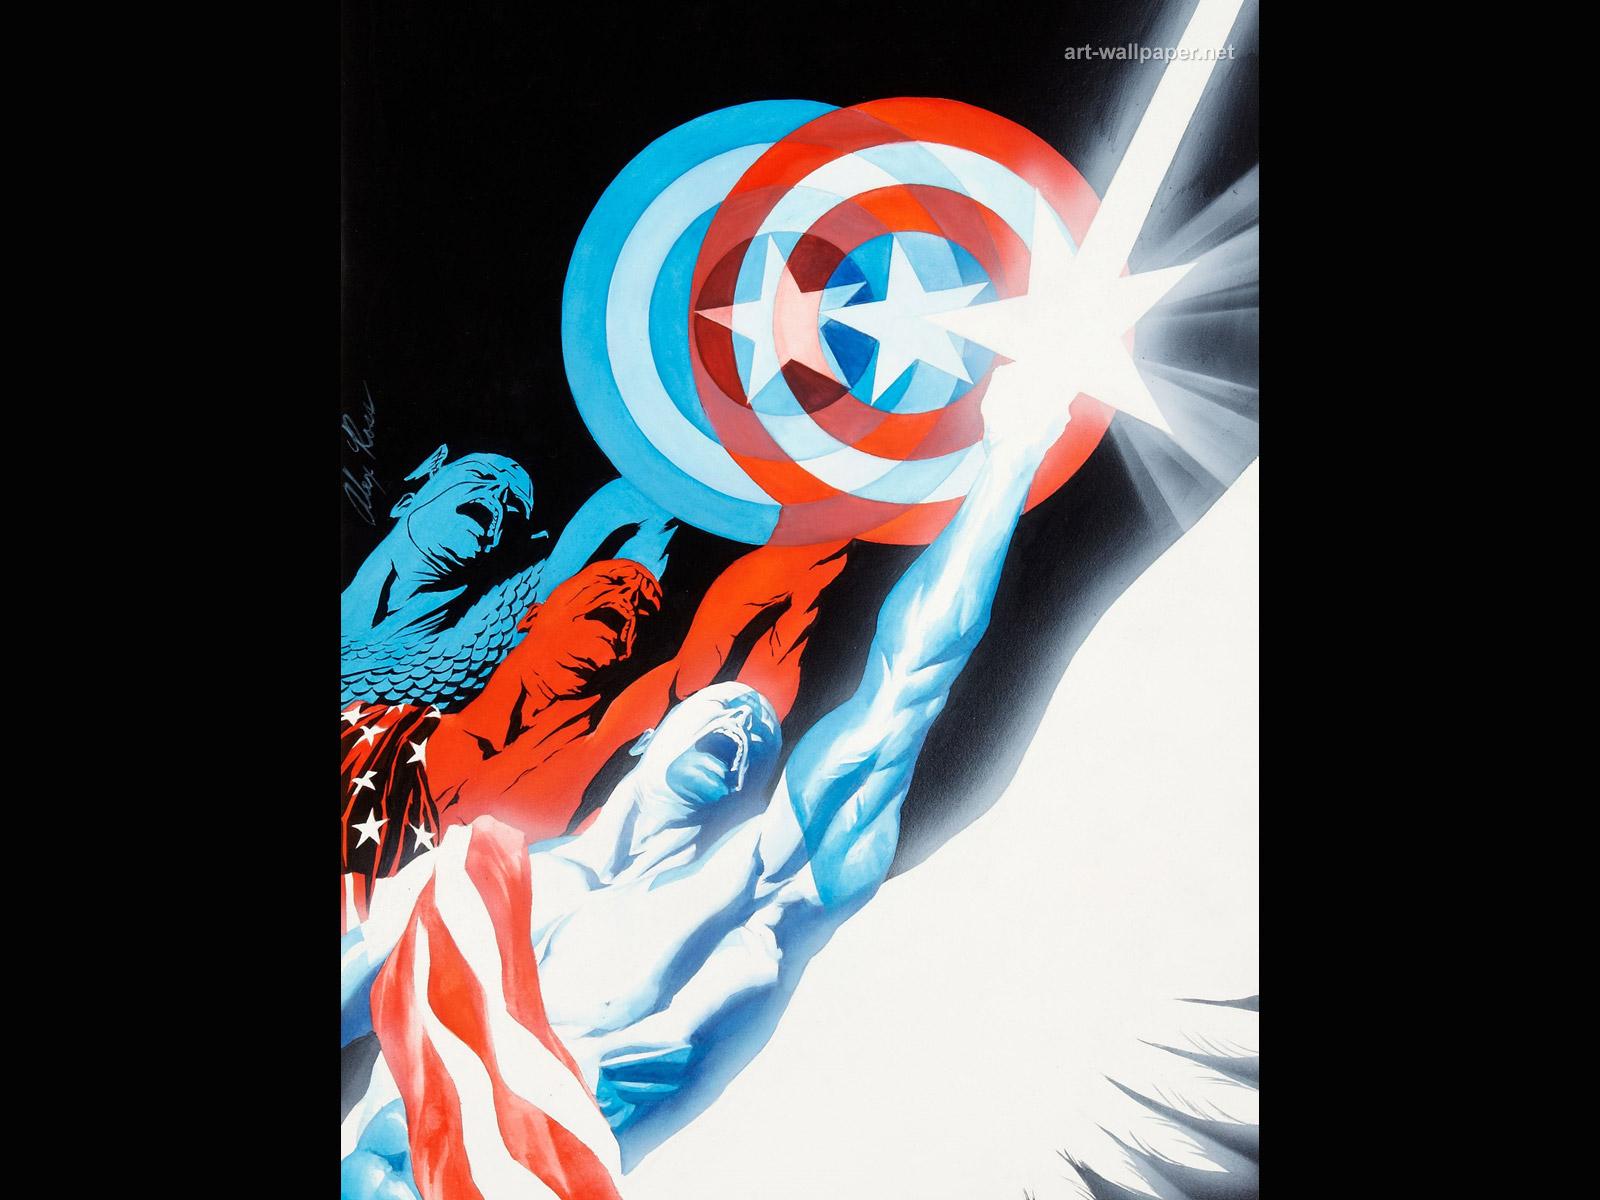 Captain America Wallpaper Captain America Comics Wallpaper 1600x1200